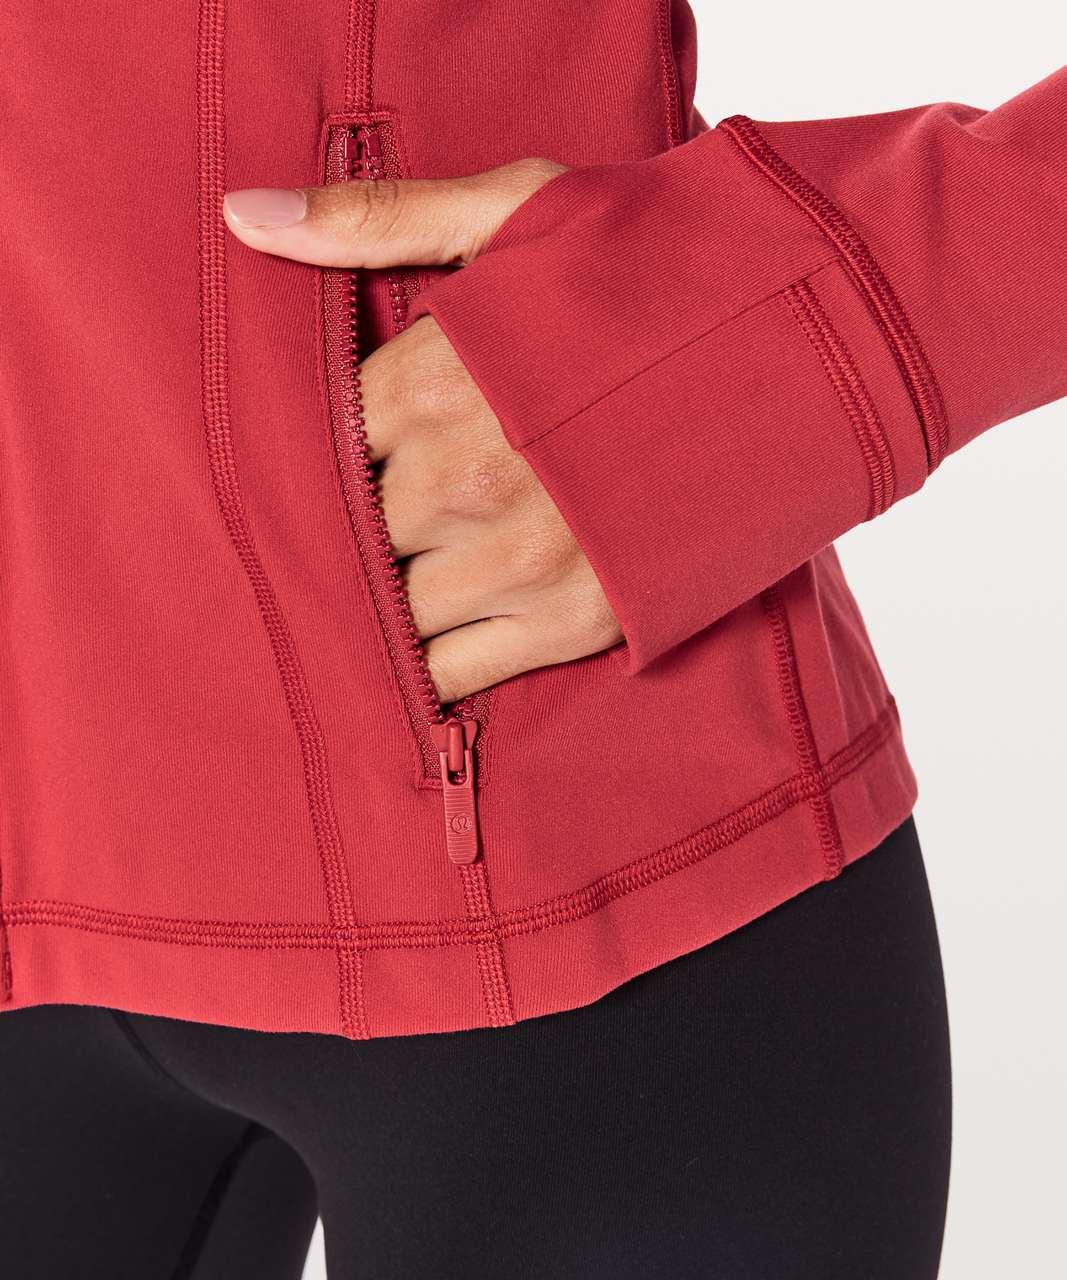 Lululemon Define Jacket - Persian Red